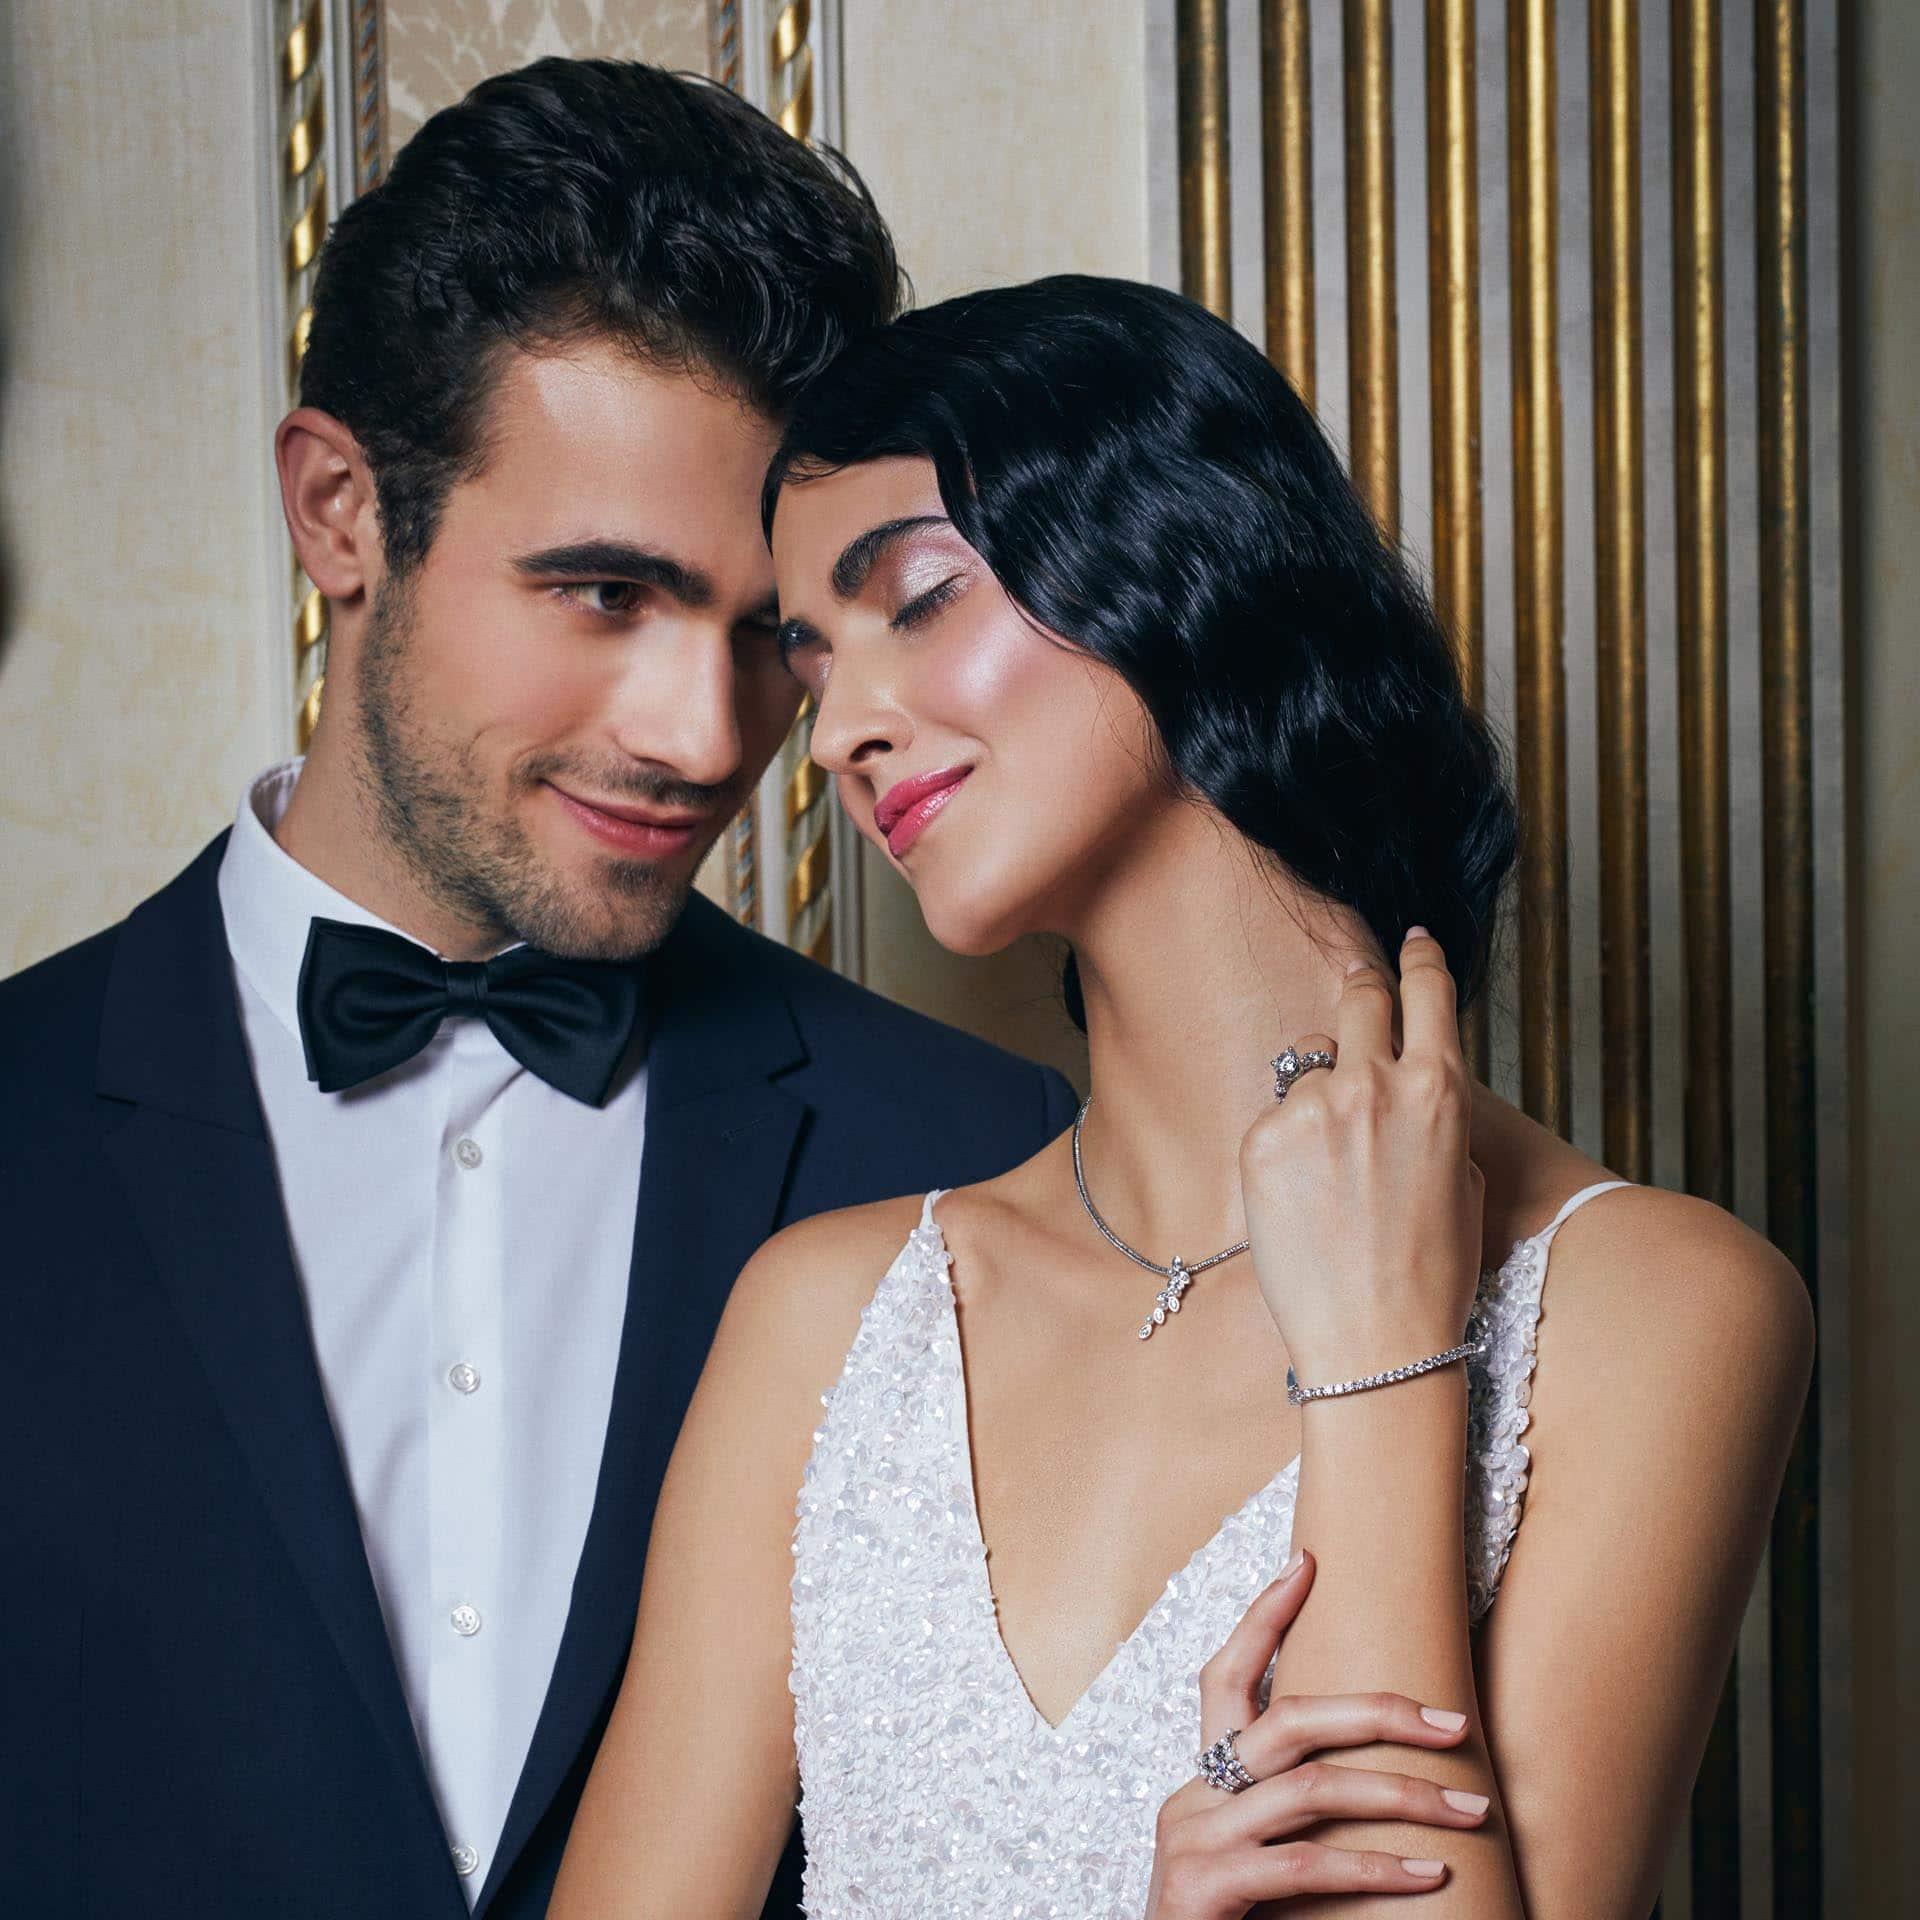 pierre-lang-wedding-couple